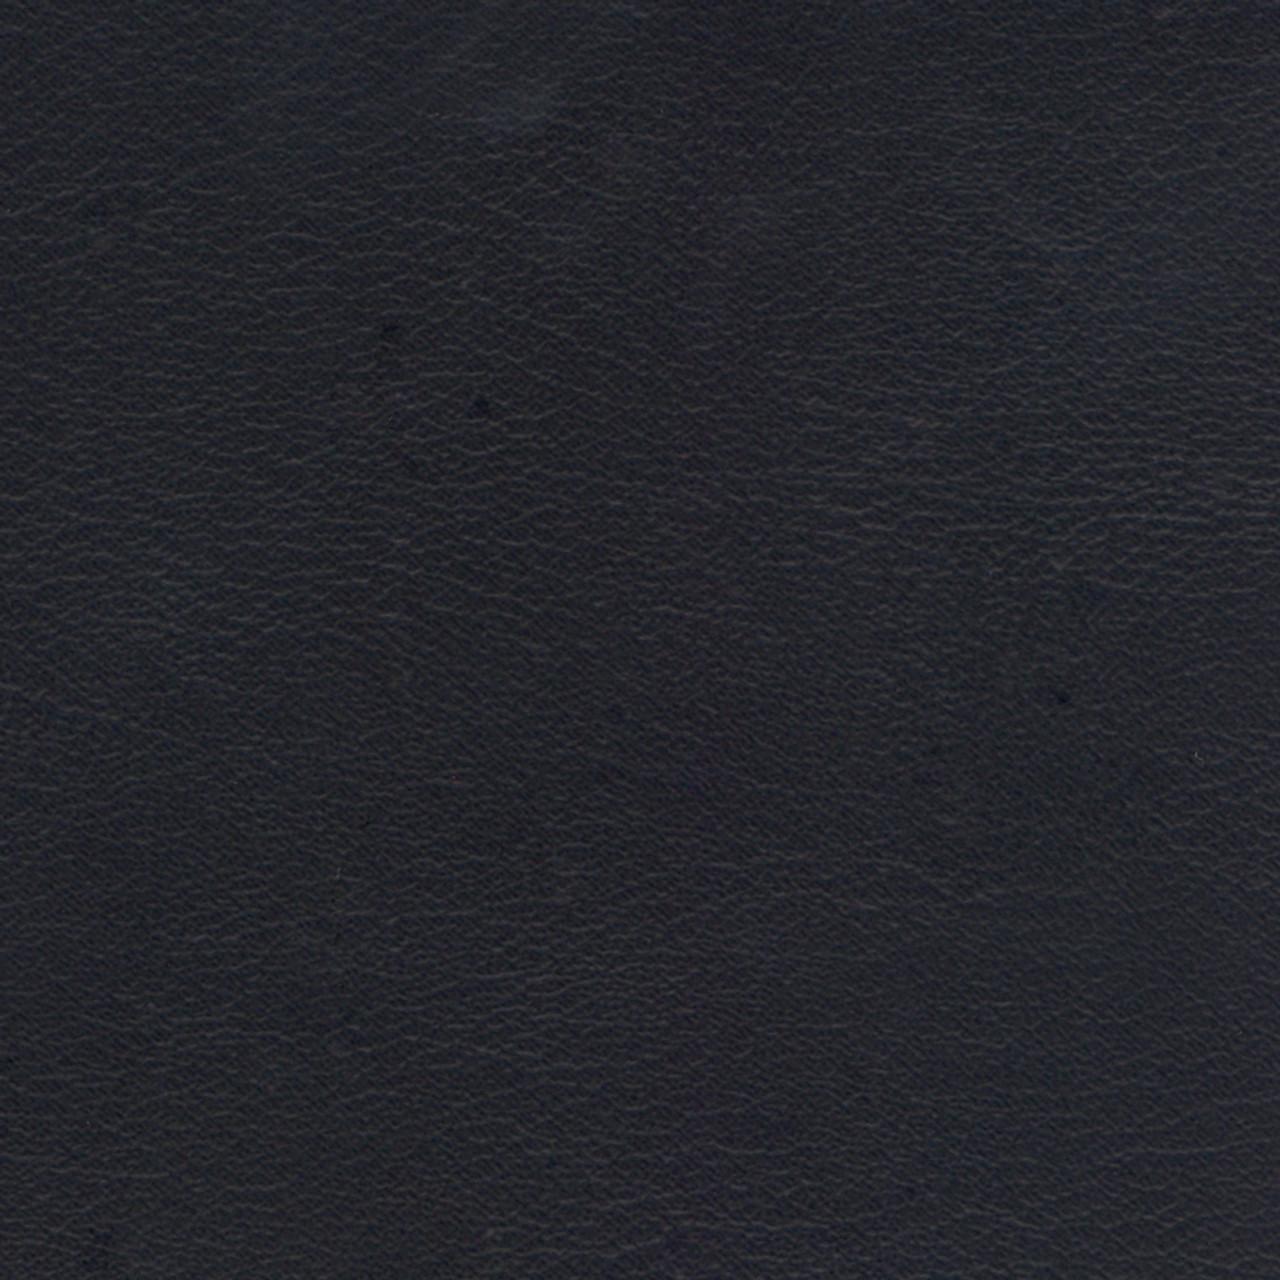 Grand Prix GPX-9467 Black